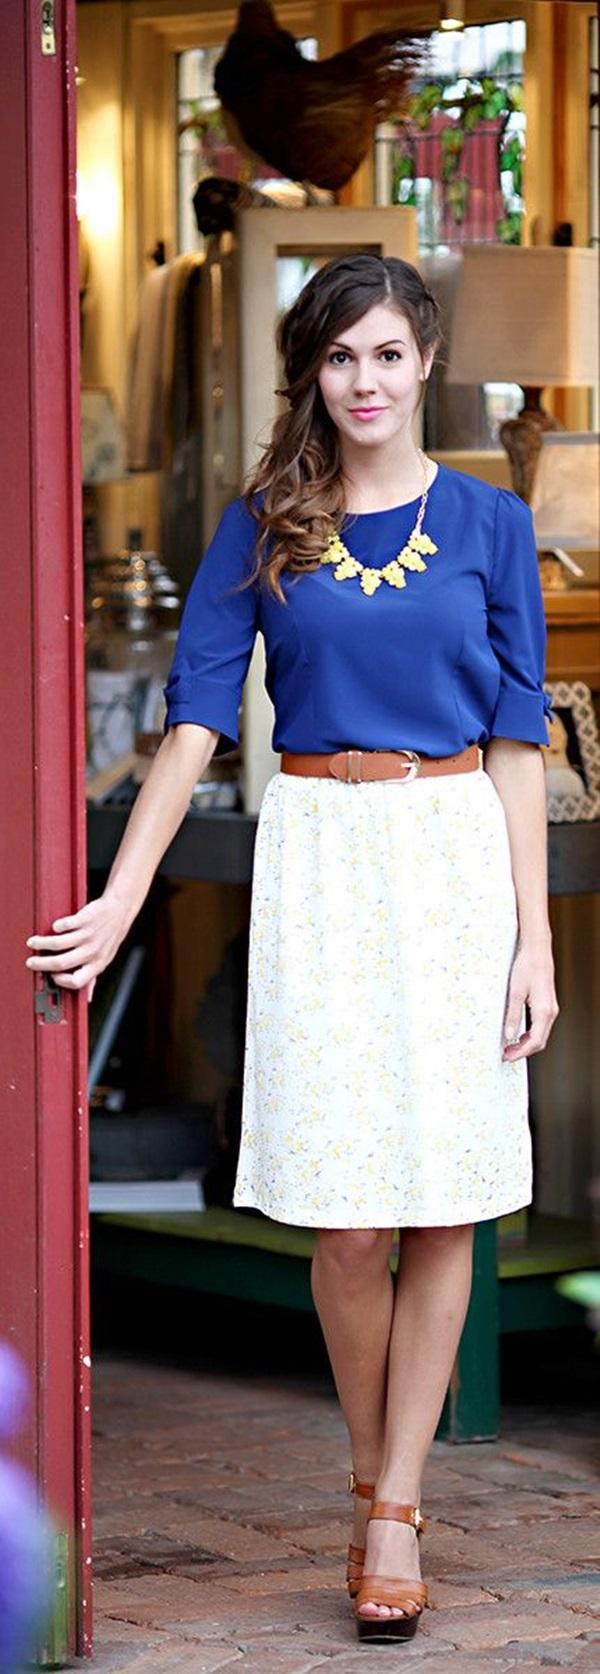 Cute Sunday Outfit Ideas (3)